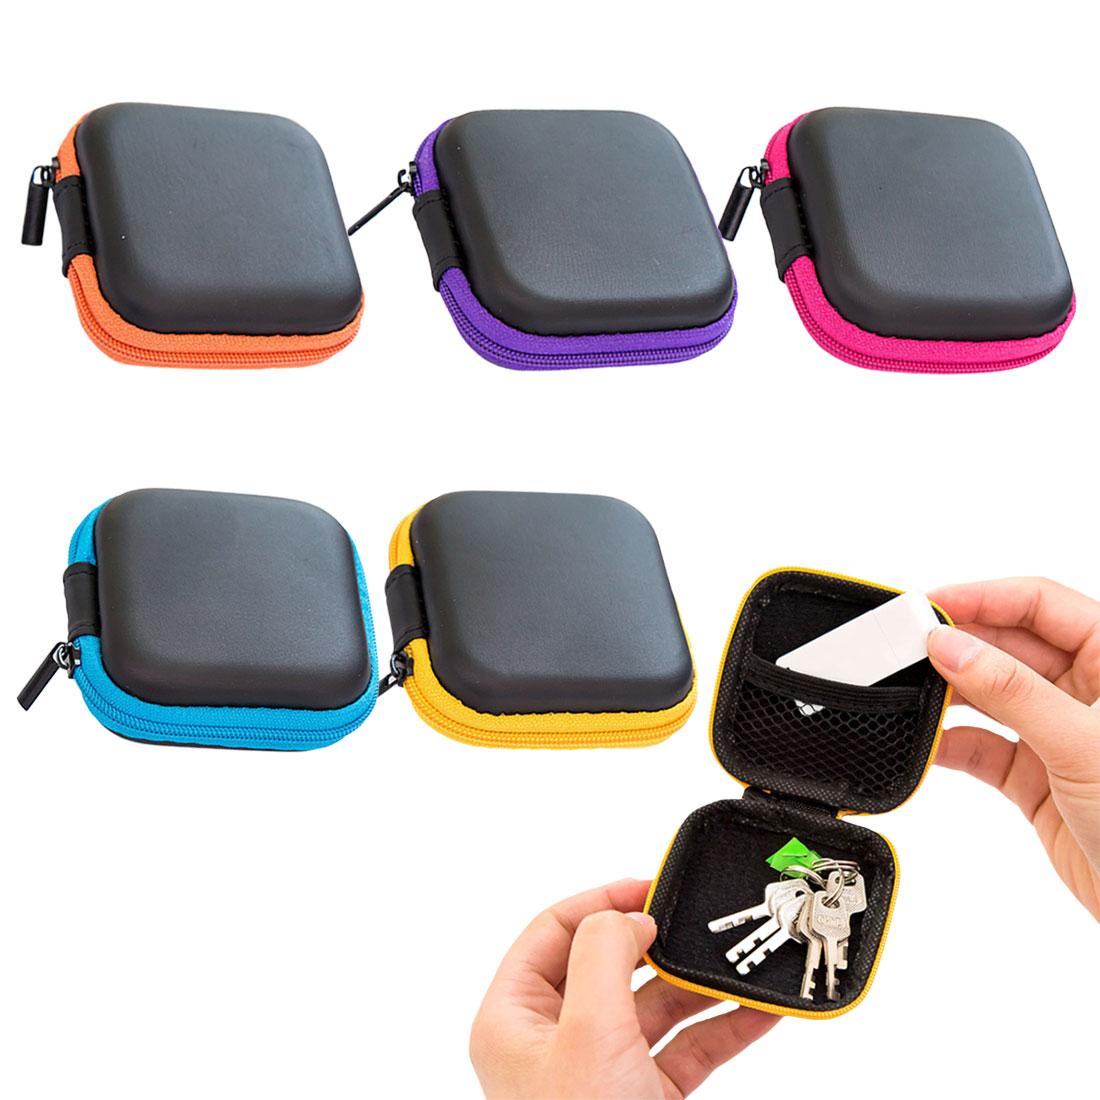 Mini Simple Earbuds Earphone Zipper Bag EVA Cute Headphone Hard Cover Earphone Case Protective Usb Cable Organizer Headset Bags